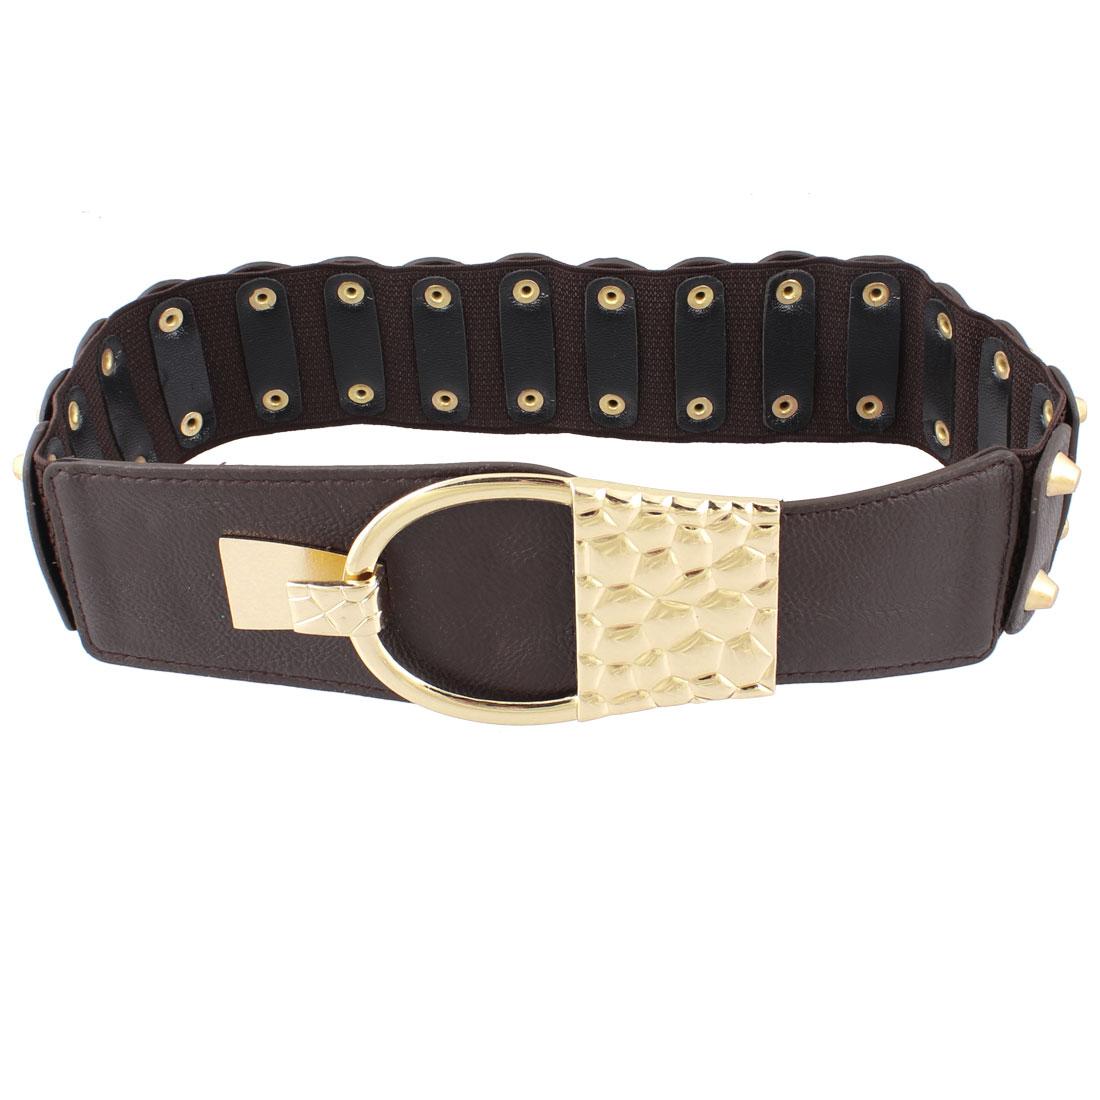 Studded Rivet Decor Brown Faux Leather Interlocking Buckle Elastic Cinch Belt